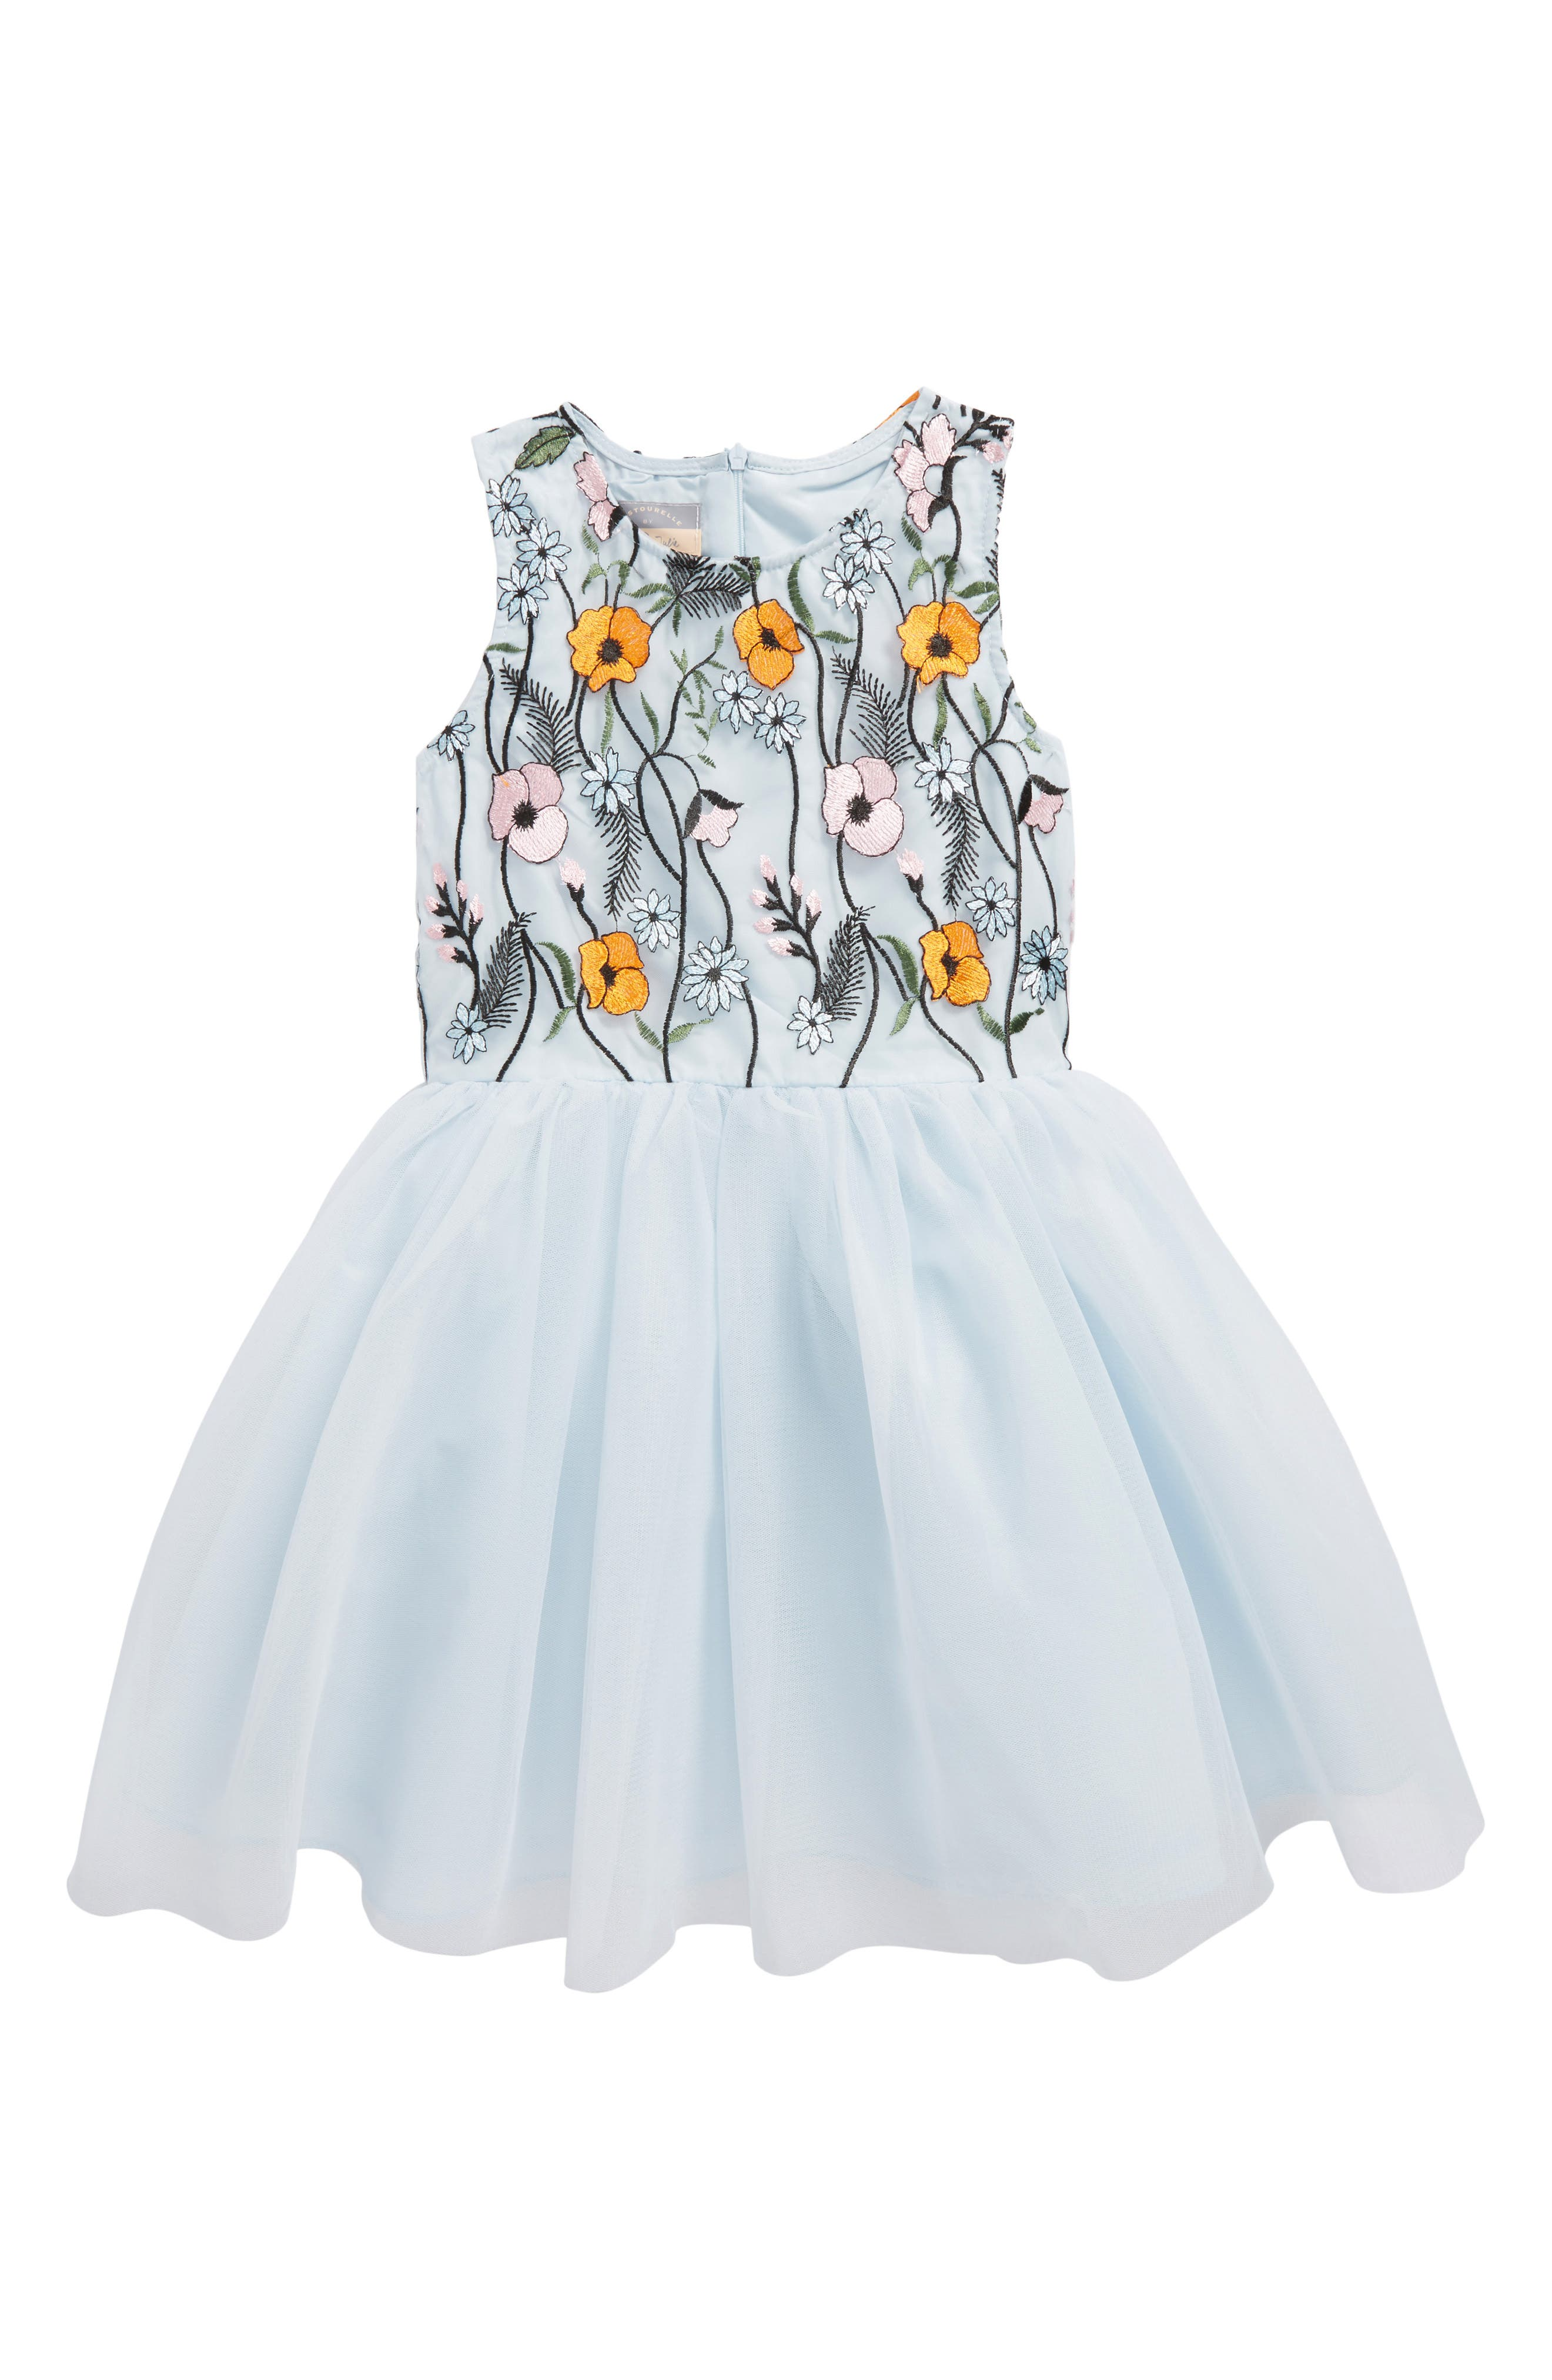 Pastourelle by Pippa & Julie Floral Embroidered Tulle Dress (Toddler Girls, Little Girls & Big Girls)